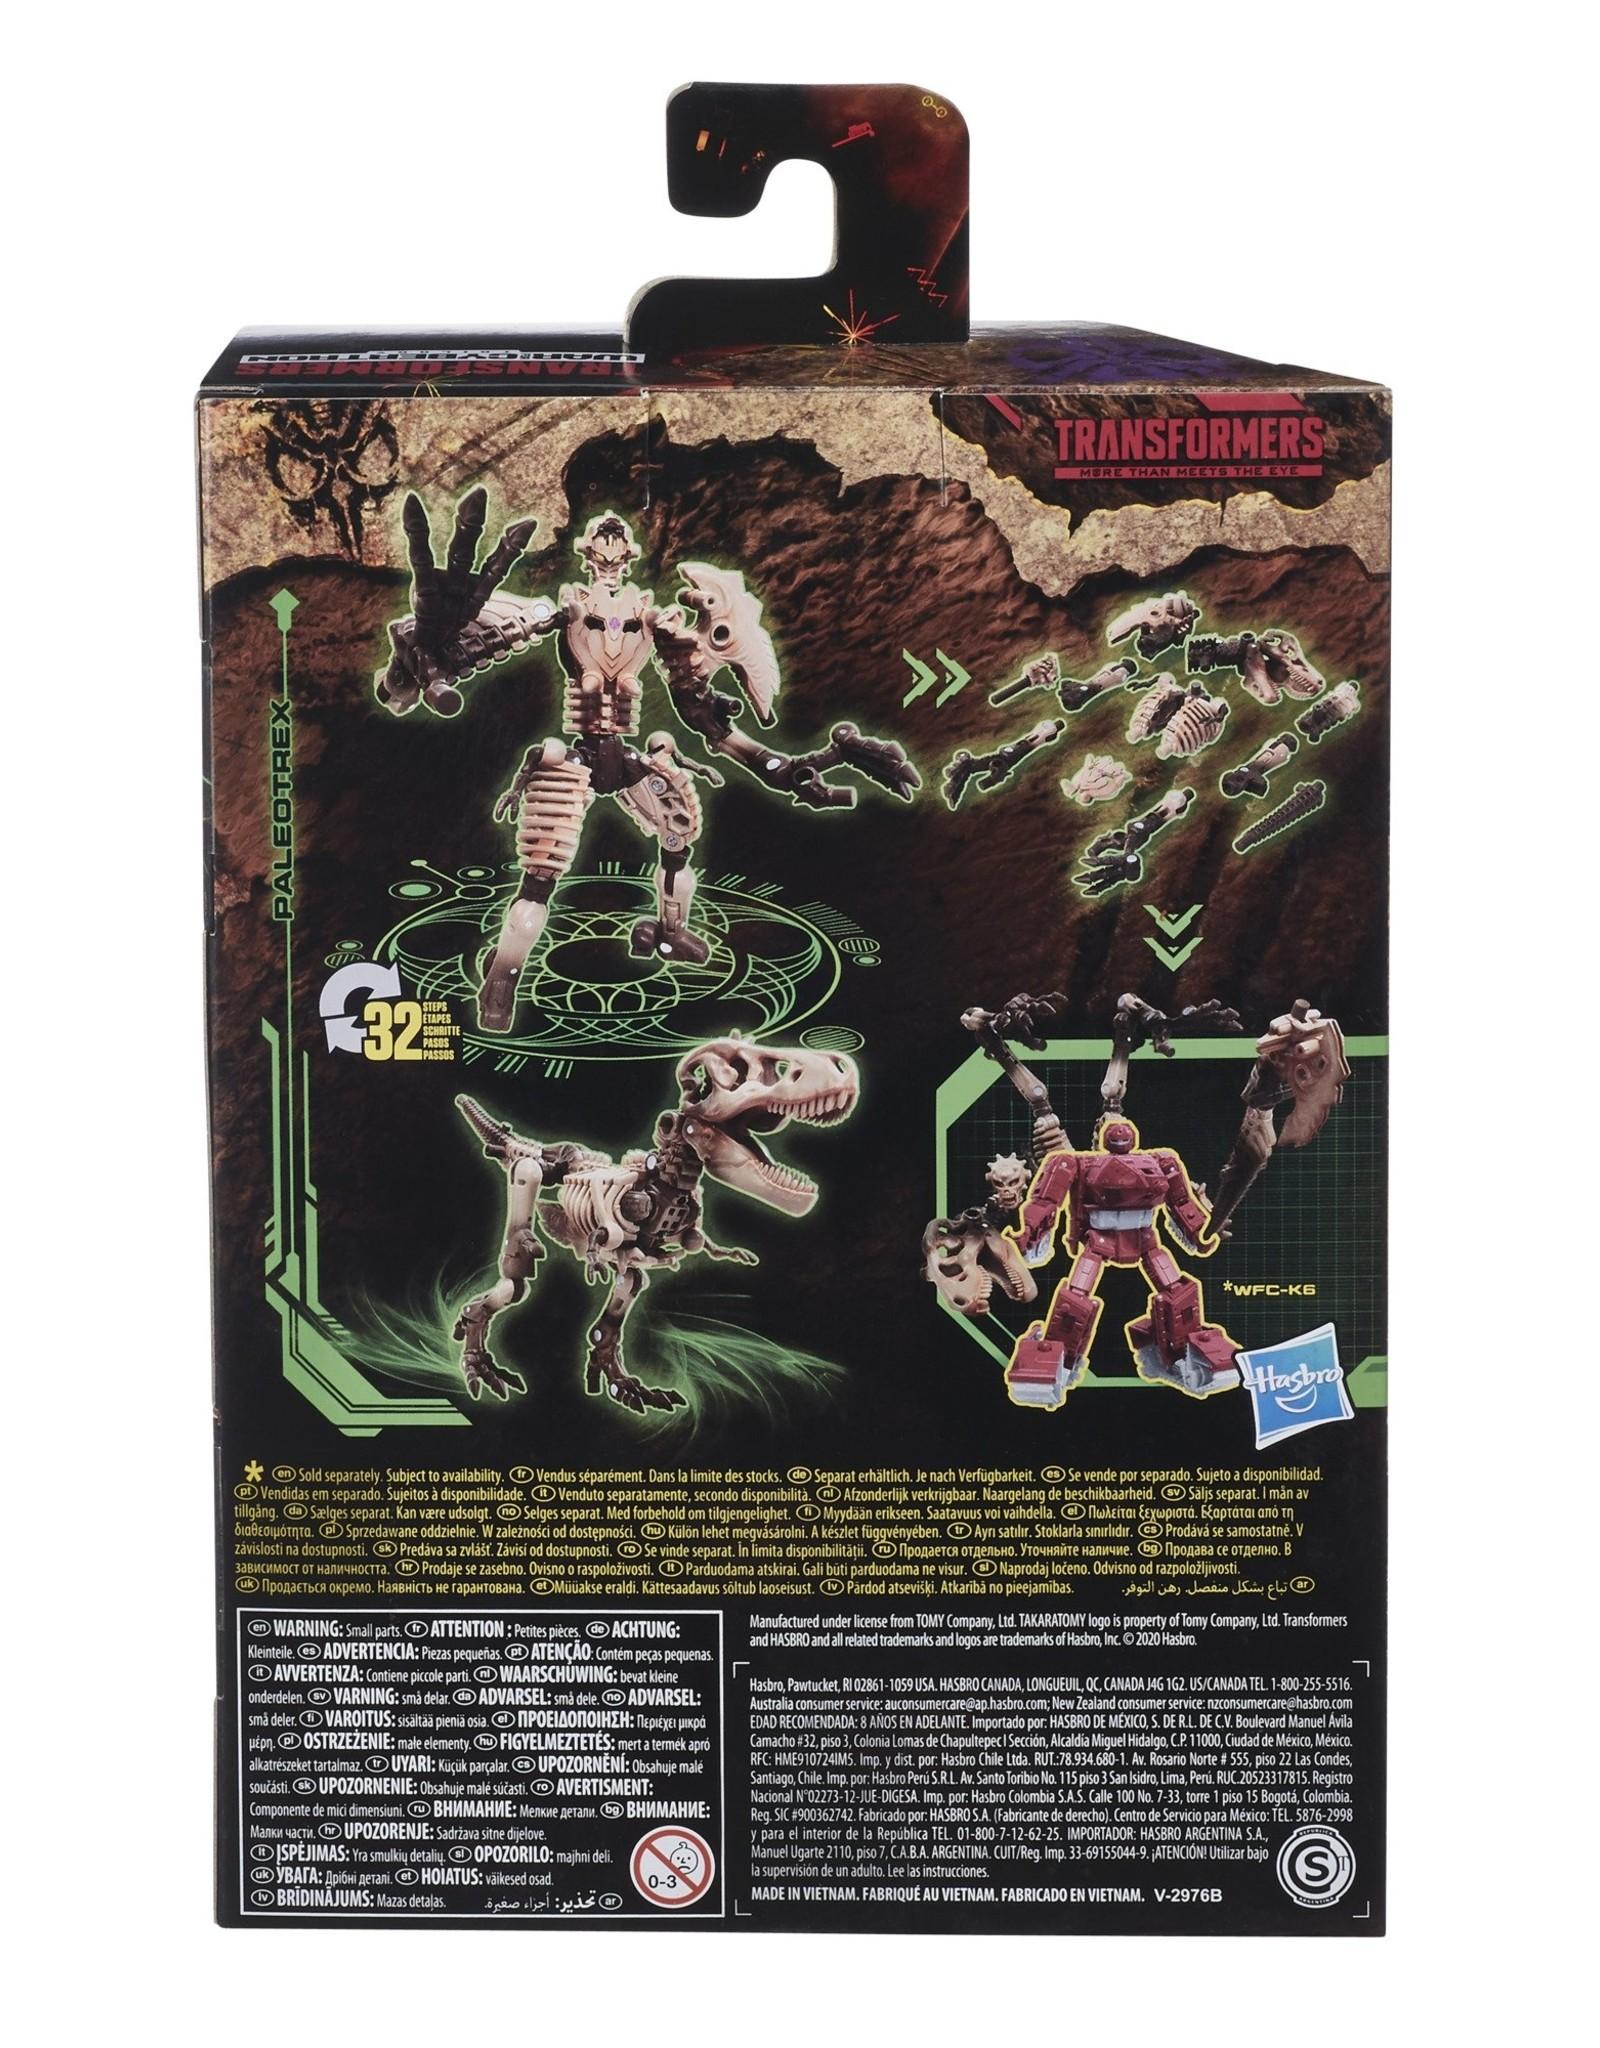 HASBRO Transformers Generations War for Cybertron: Kingdom Deluxe WFC-K7 Paleotrex